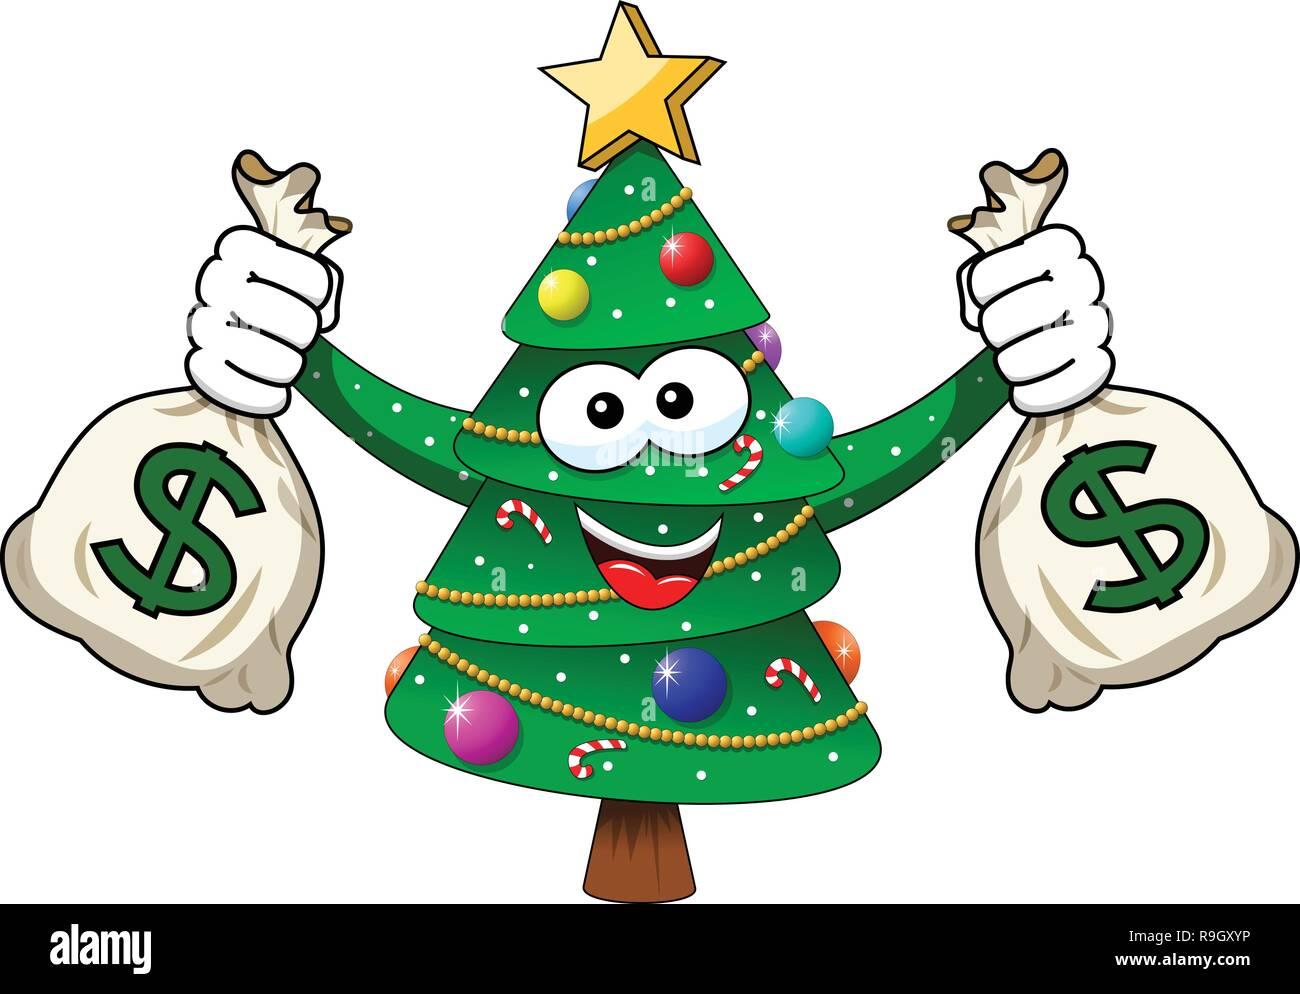 xmas christmas tree mascot character holding money dollar sacks richness isolated on white - Stock Vector